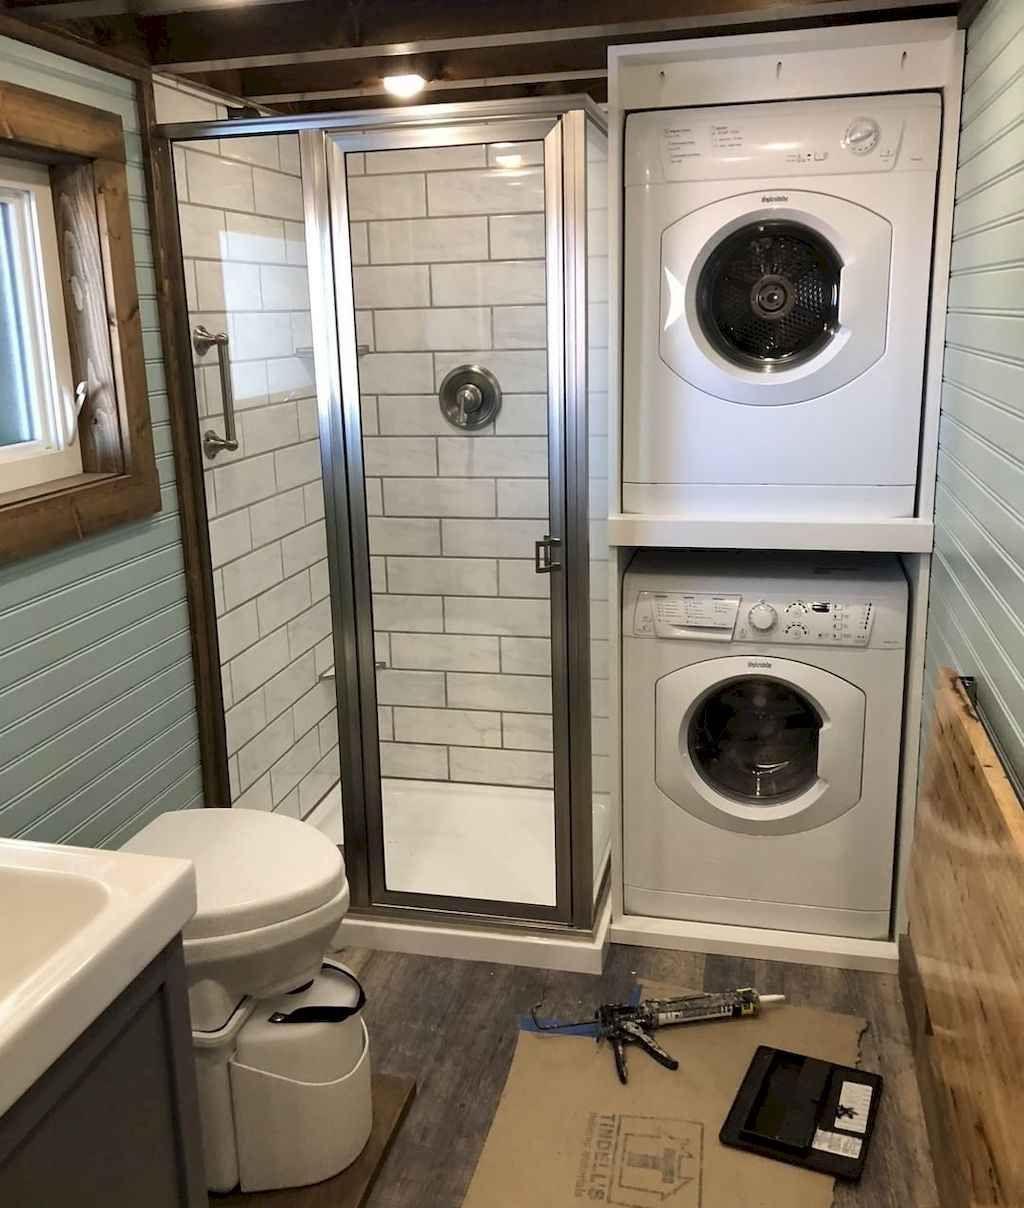 60 Impressive Tiny Bathroom Remodel Ideas - DoMakeover.com #tinyhouseliving